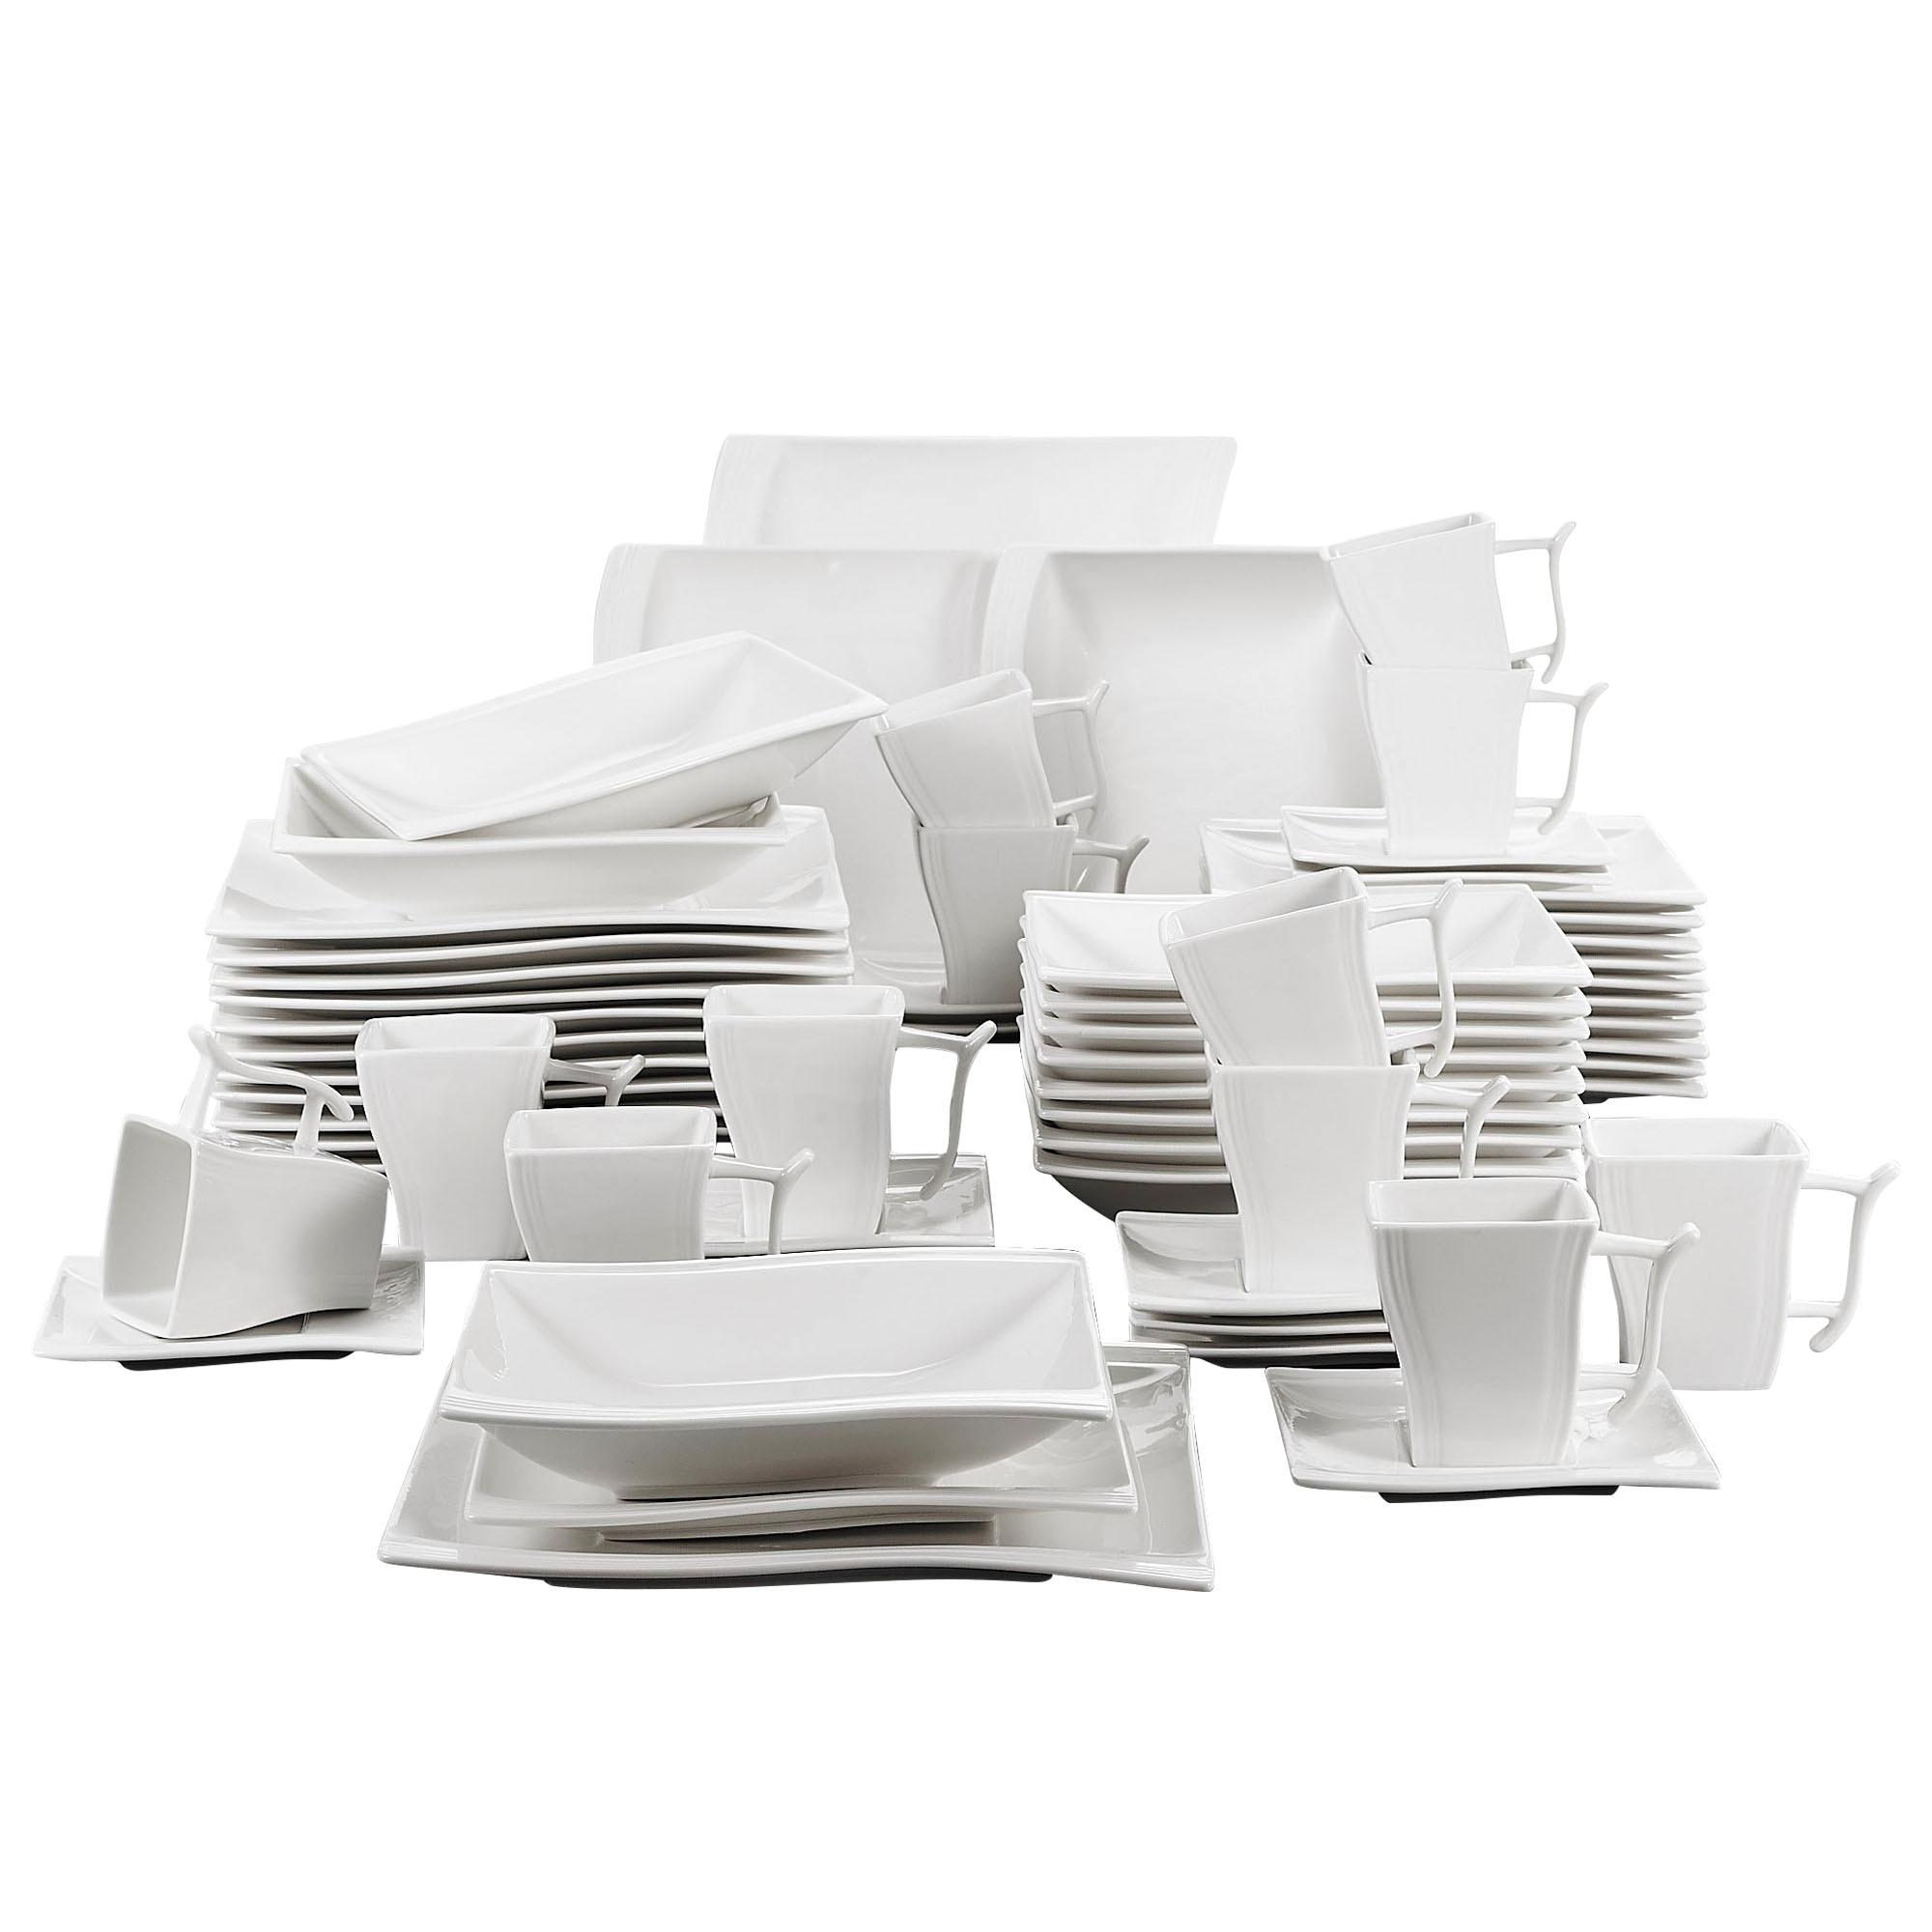 MALACASA FLORA 60-Piece White Porcelain Dinner Set with 12*Cup,Saucer,Dessert Soup Dinner Plate Dinnerware Set Service 12 Person 1